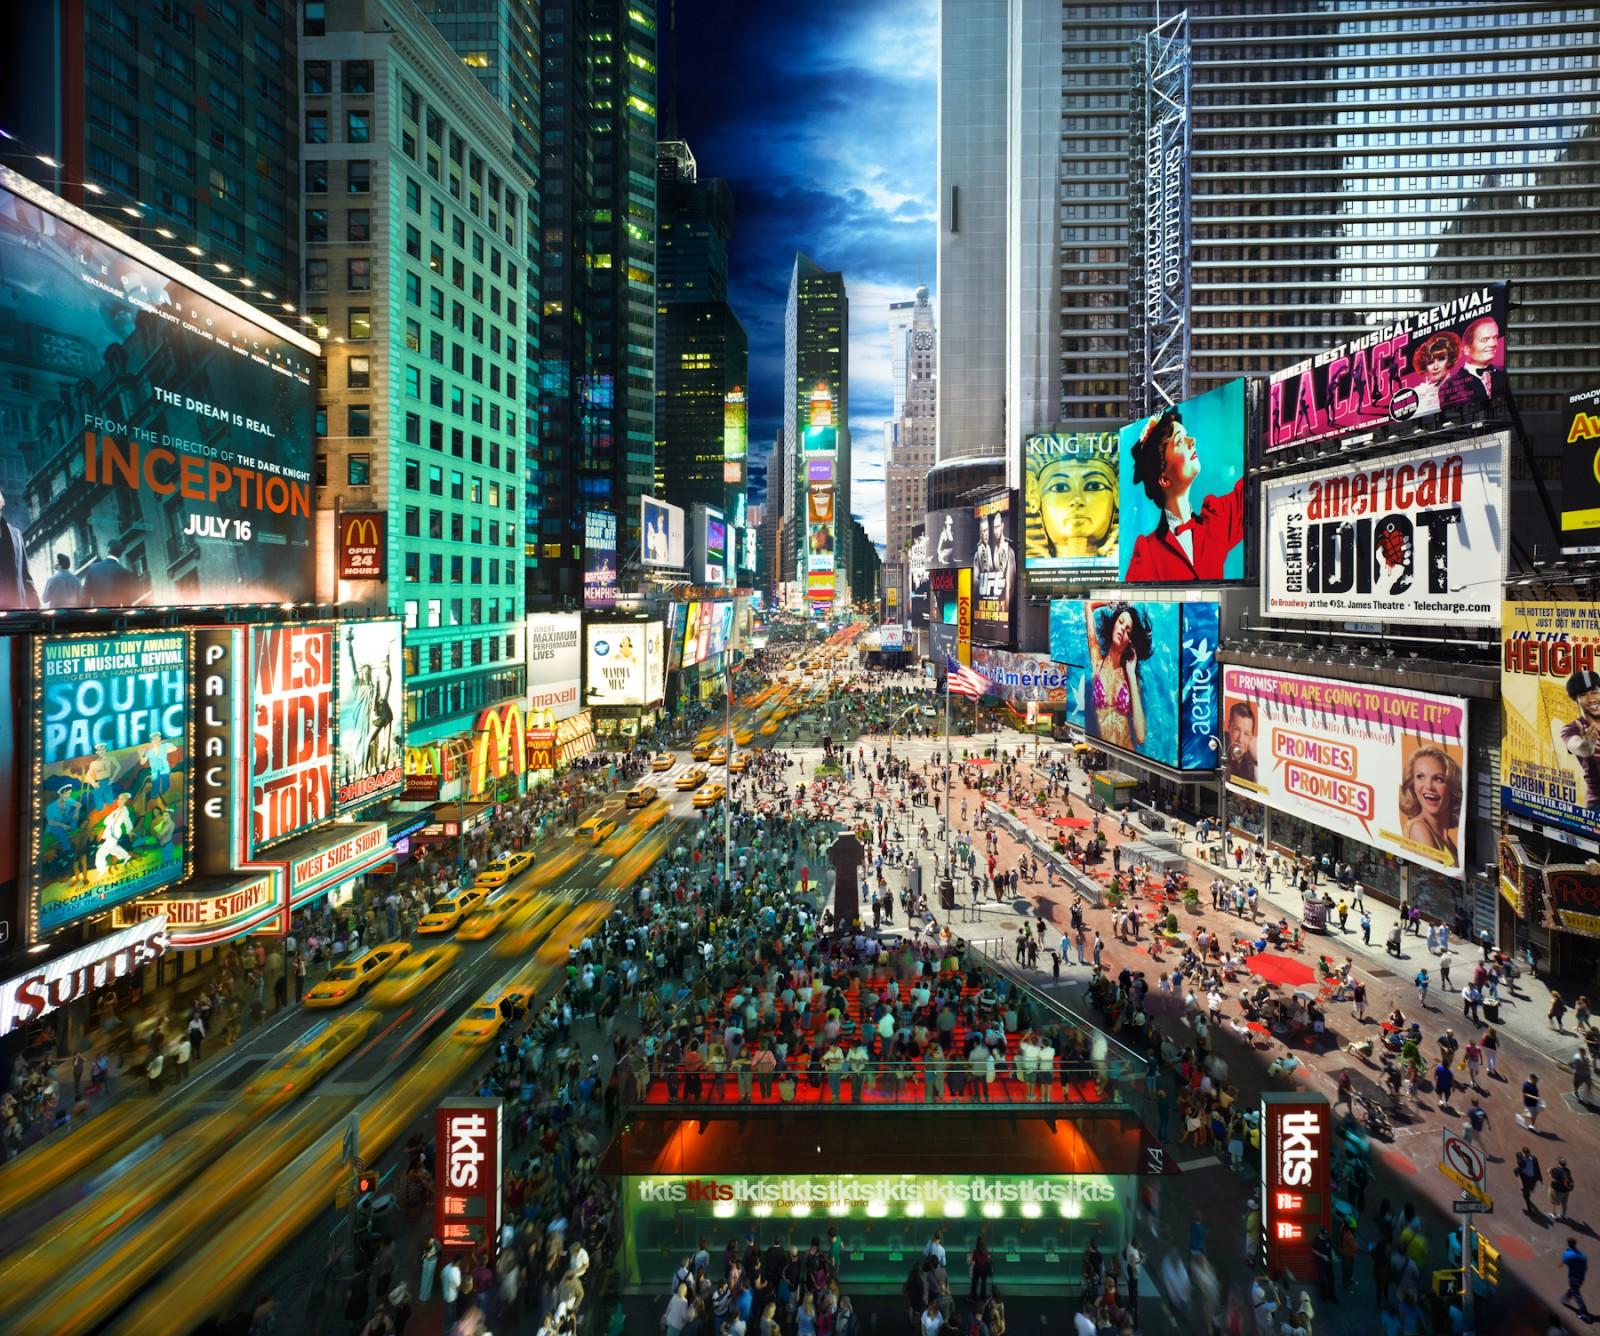 "День и ночь в Нью-Йорке. Фотопроект ""Day to Night"" Стивена Уилкса (Stephen Wilkes)"